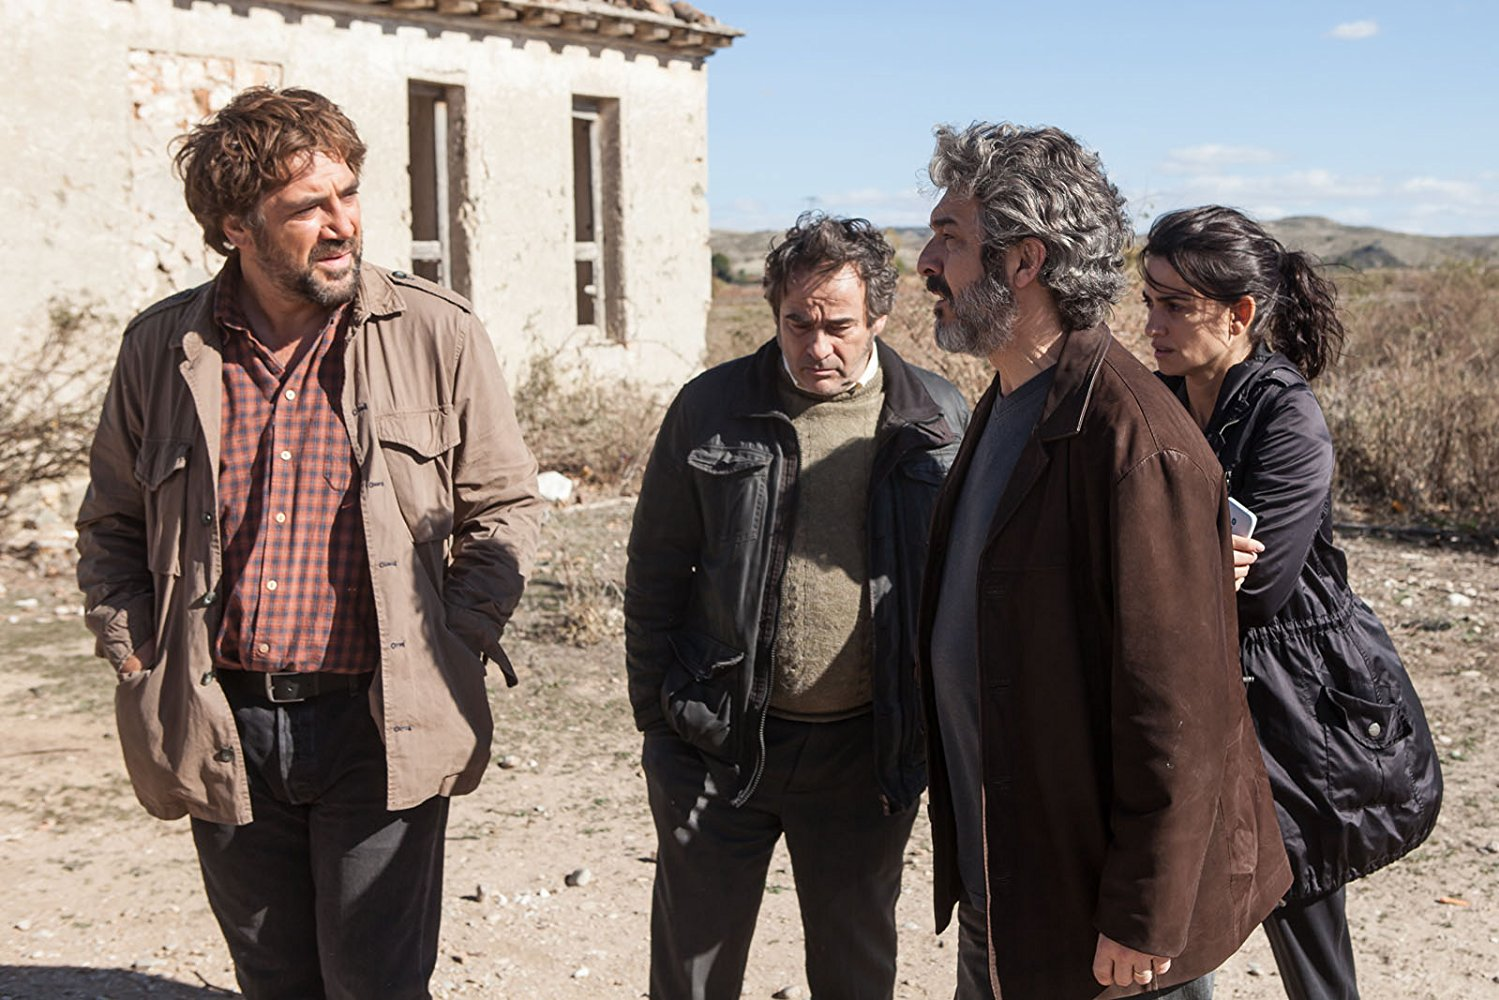 Javier Bardem, Eduard Fernández, Ricardo Darín and Penélope Cruz